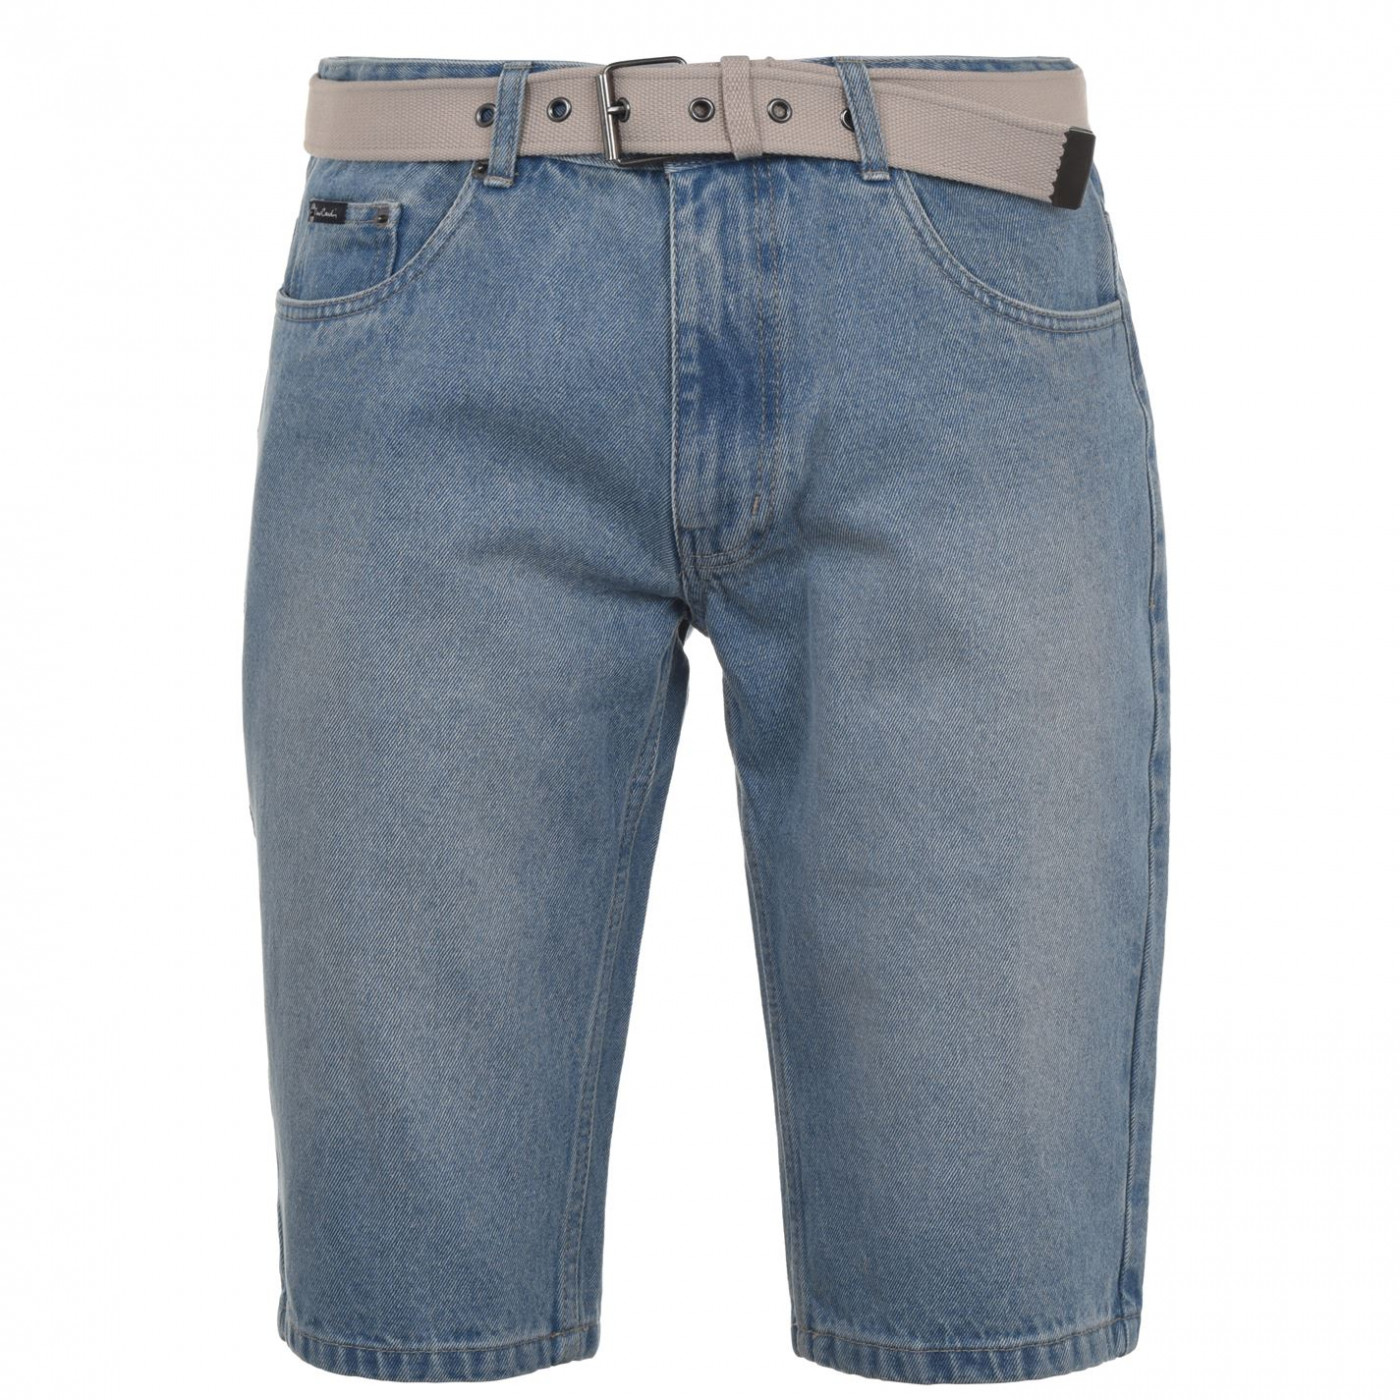 Men's shorts Pierre Cardin Denim